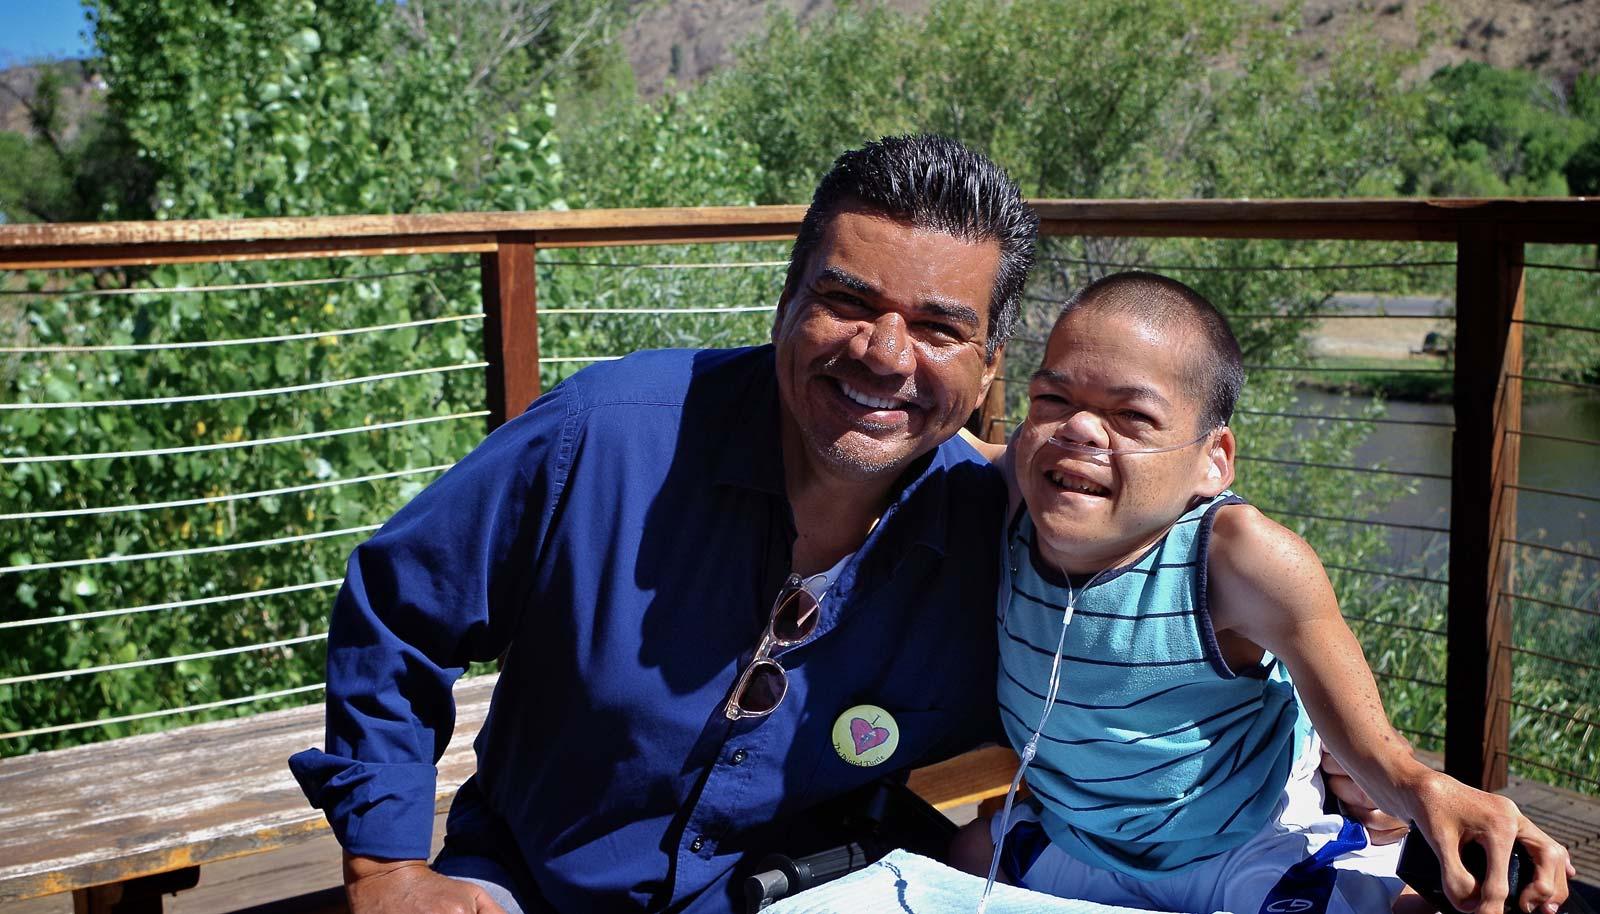 George-Lopez-Foundation-Kidney-Disease-Transplant-Camp-003.jpg